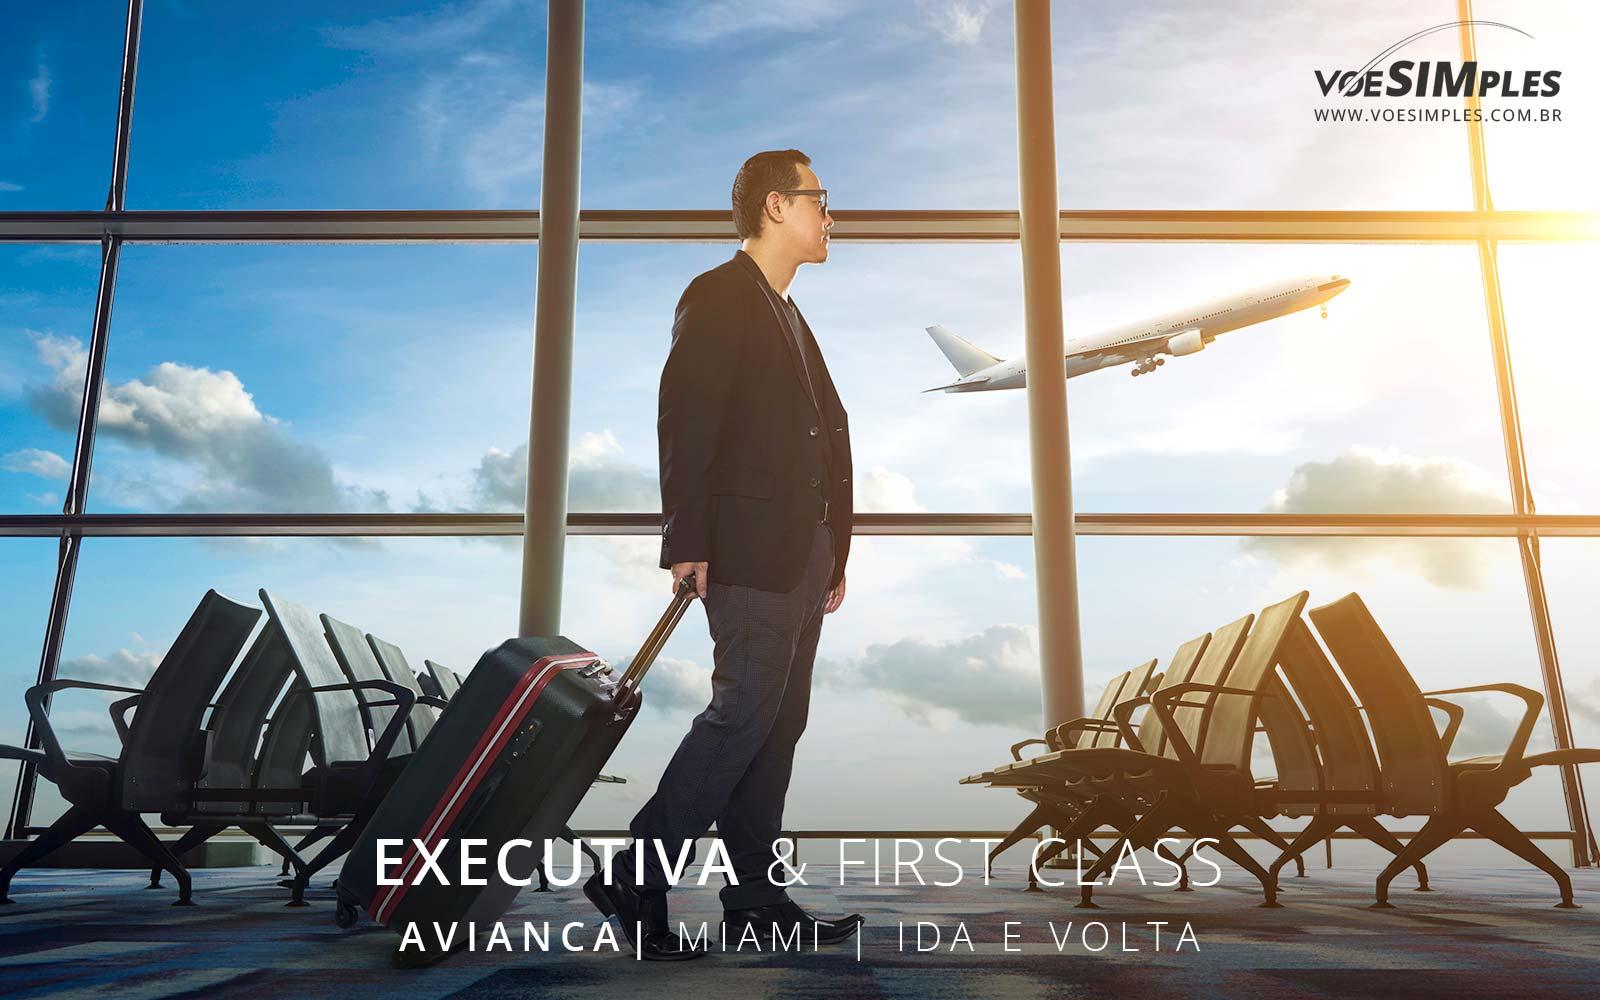 Passagem aérea executiva promocional